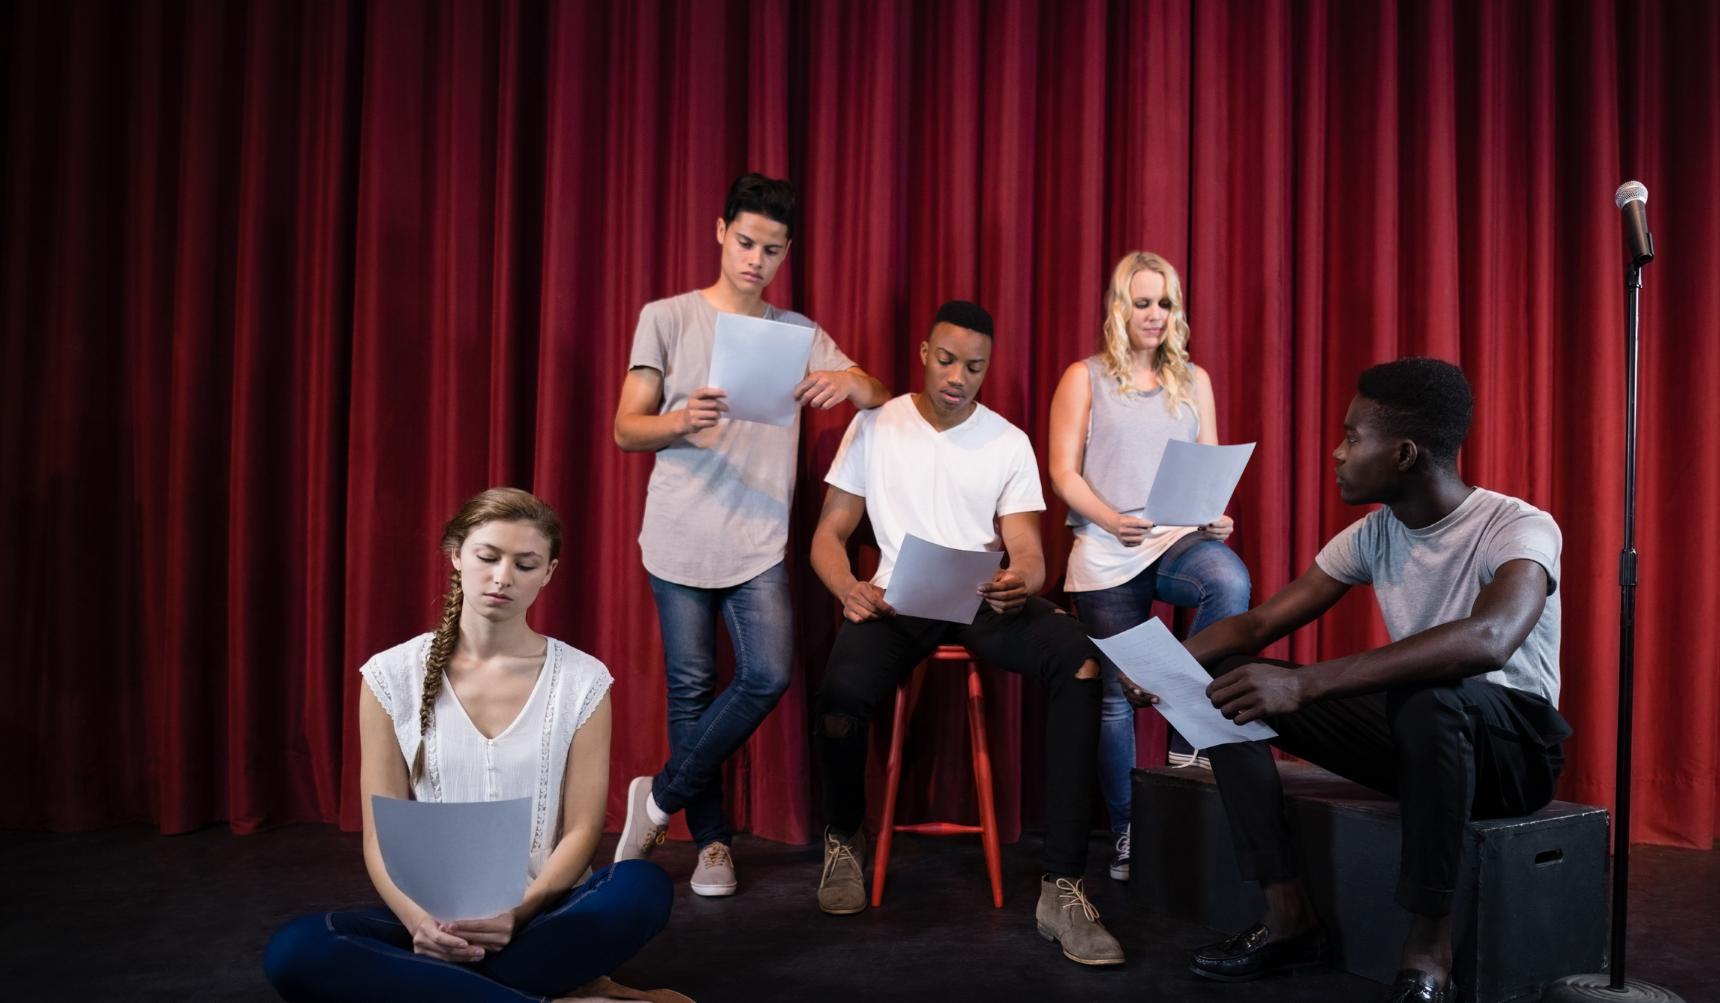 Drama pupils on stage reading scripts